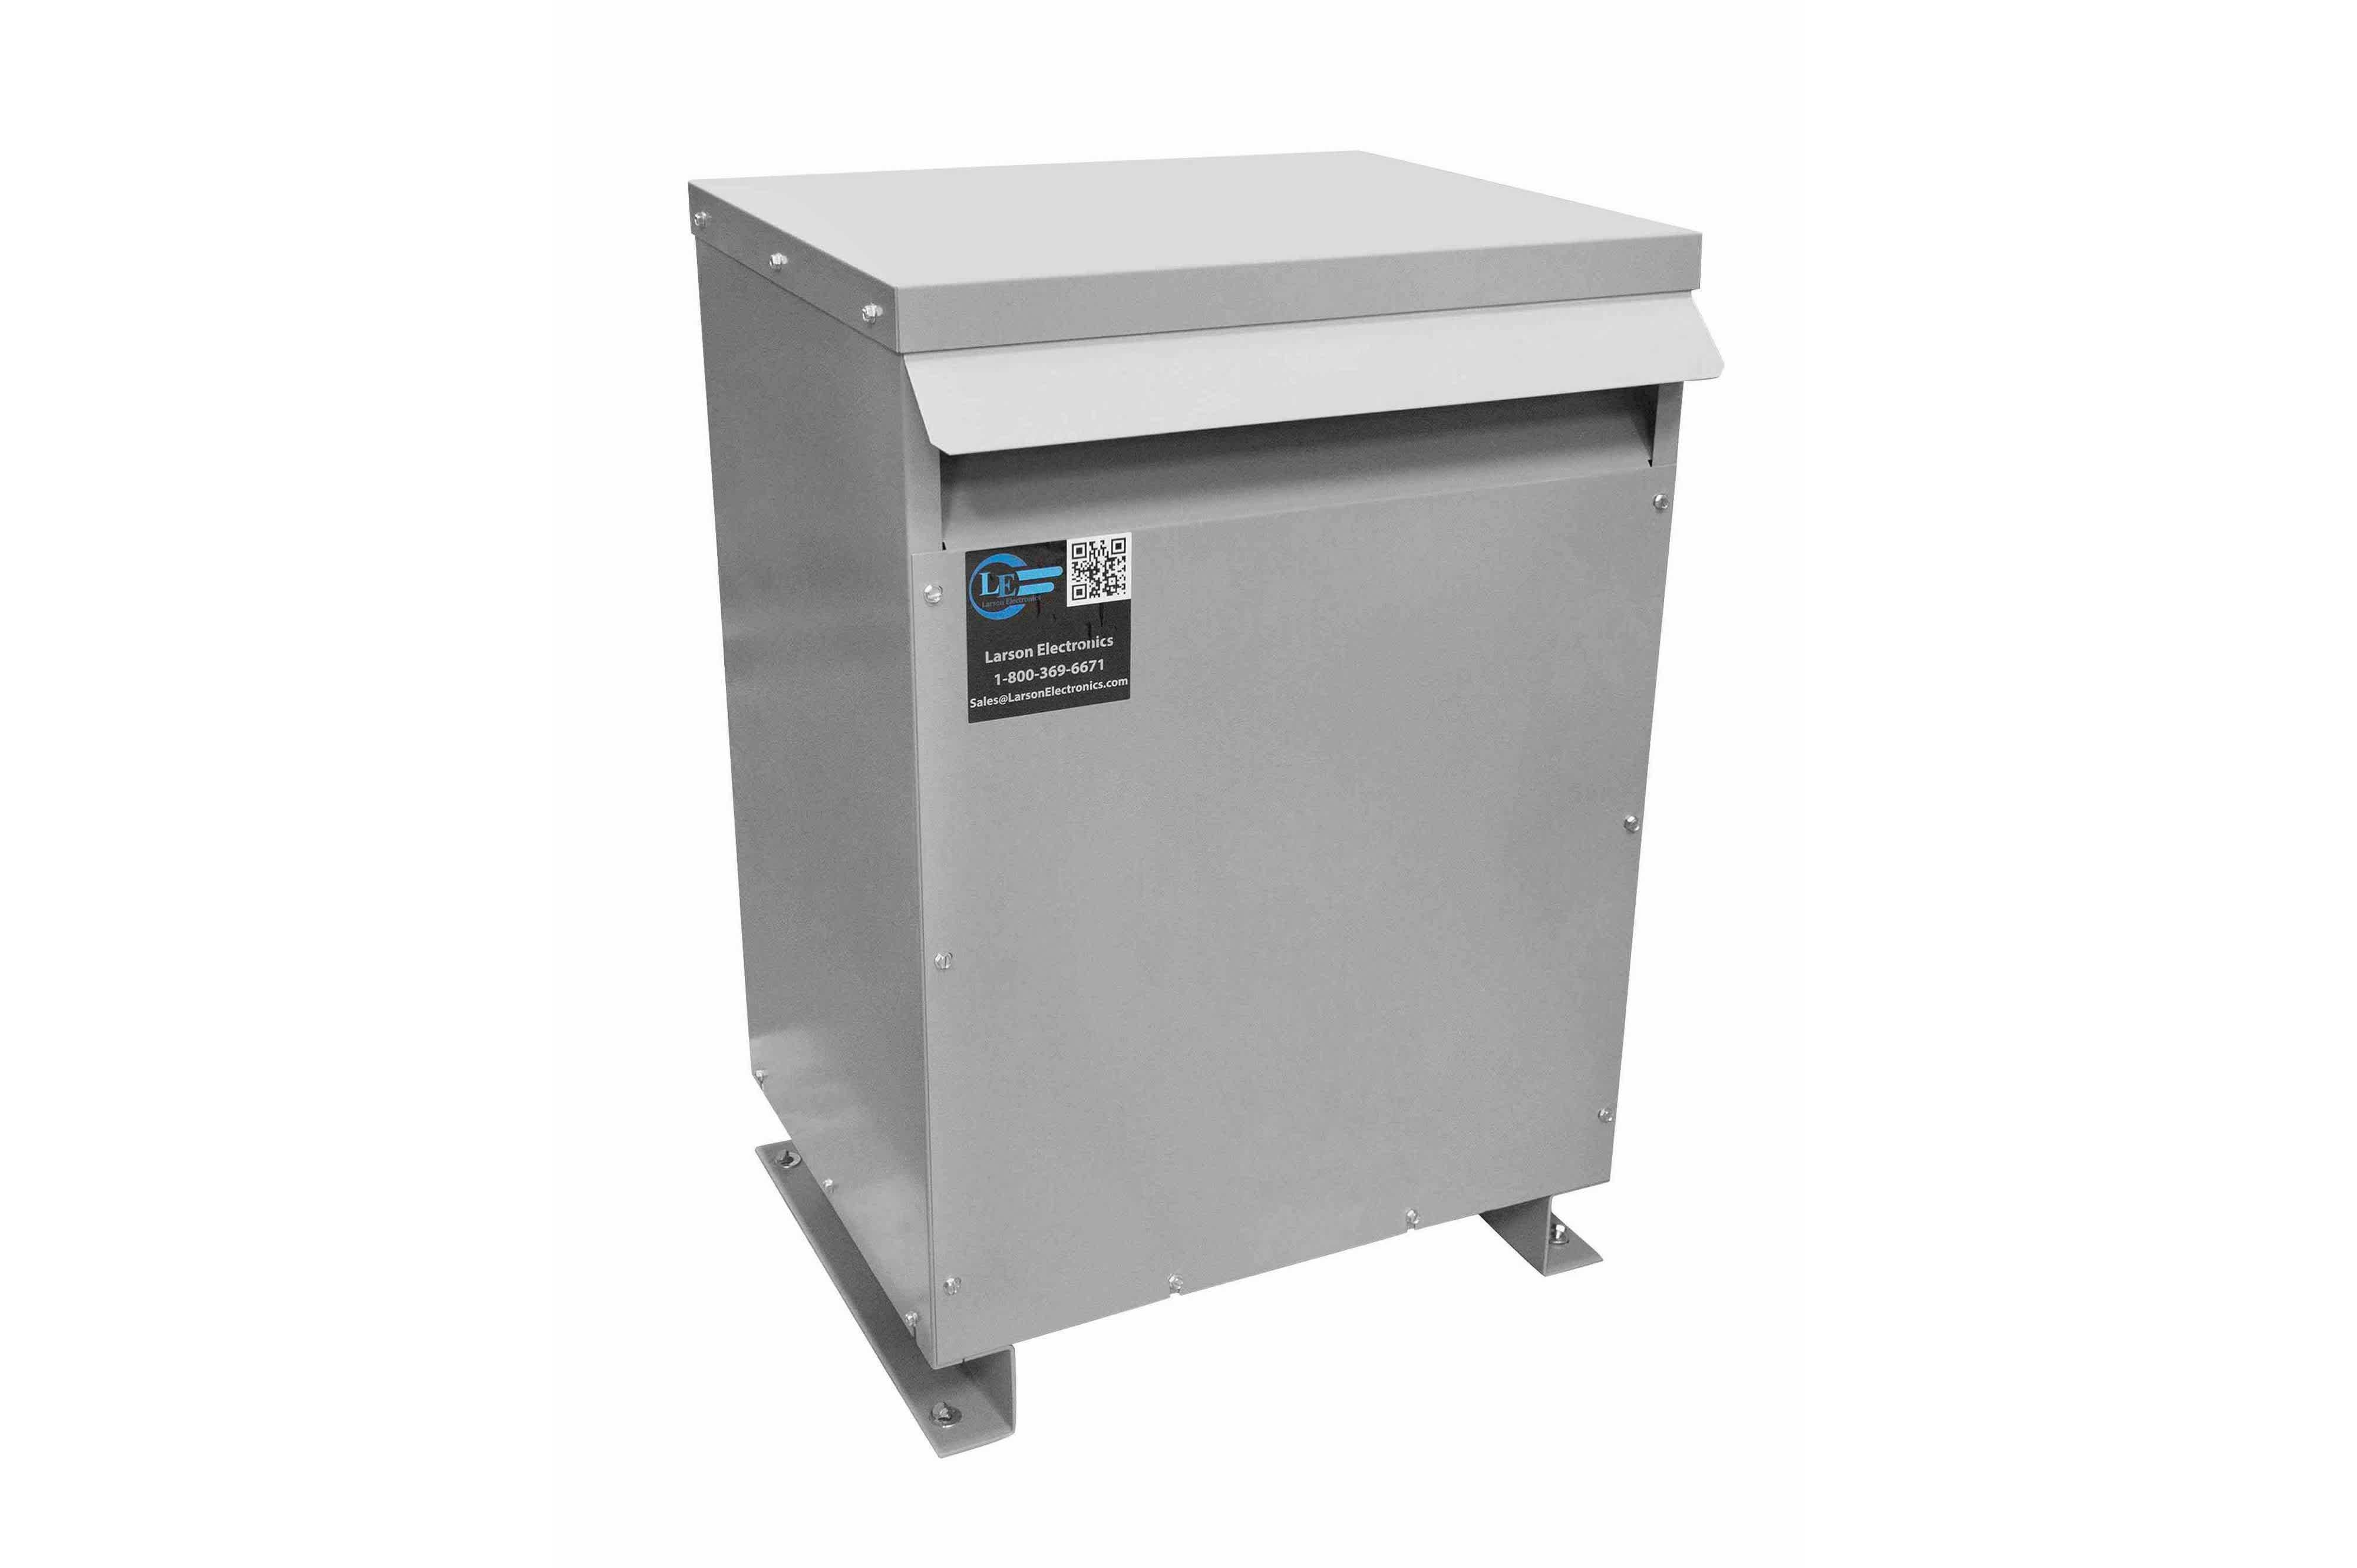 115 kVA 3PH Isolation Transformer, 240V Wye Primary, 400V Delta Secondary, N3R, Ventilated, 60 Hz